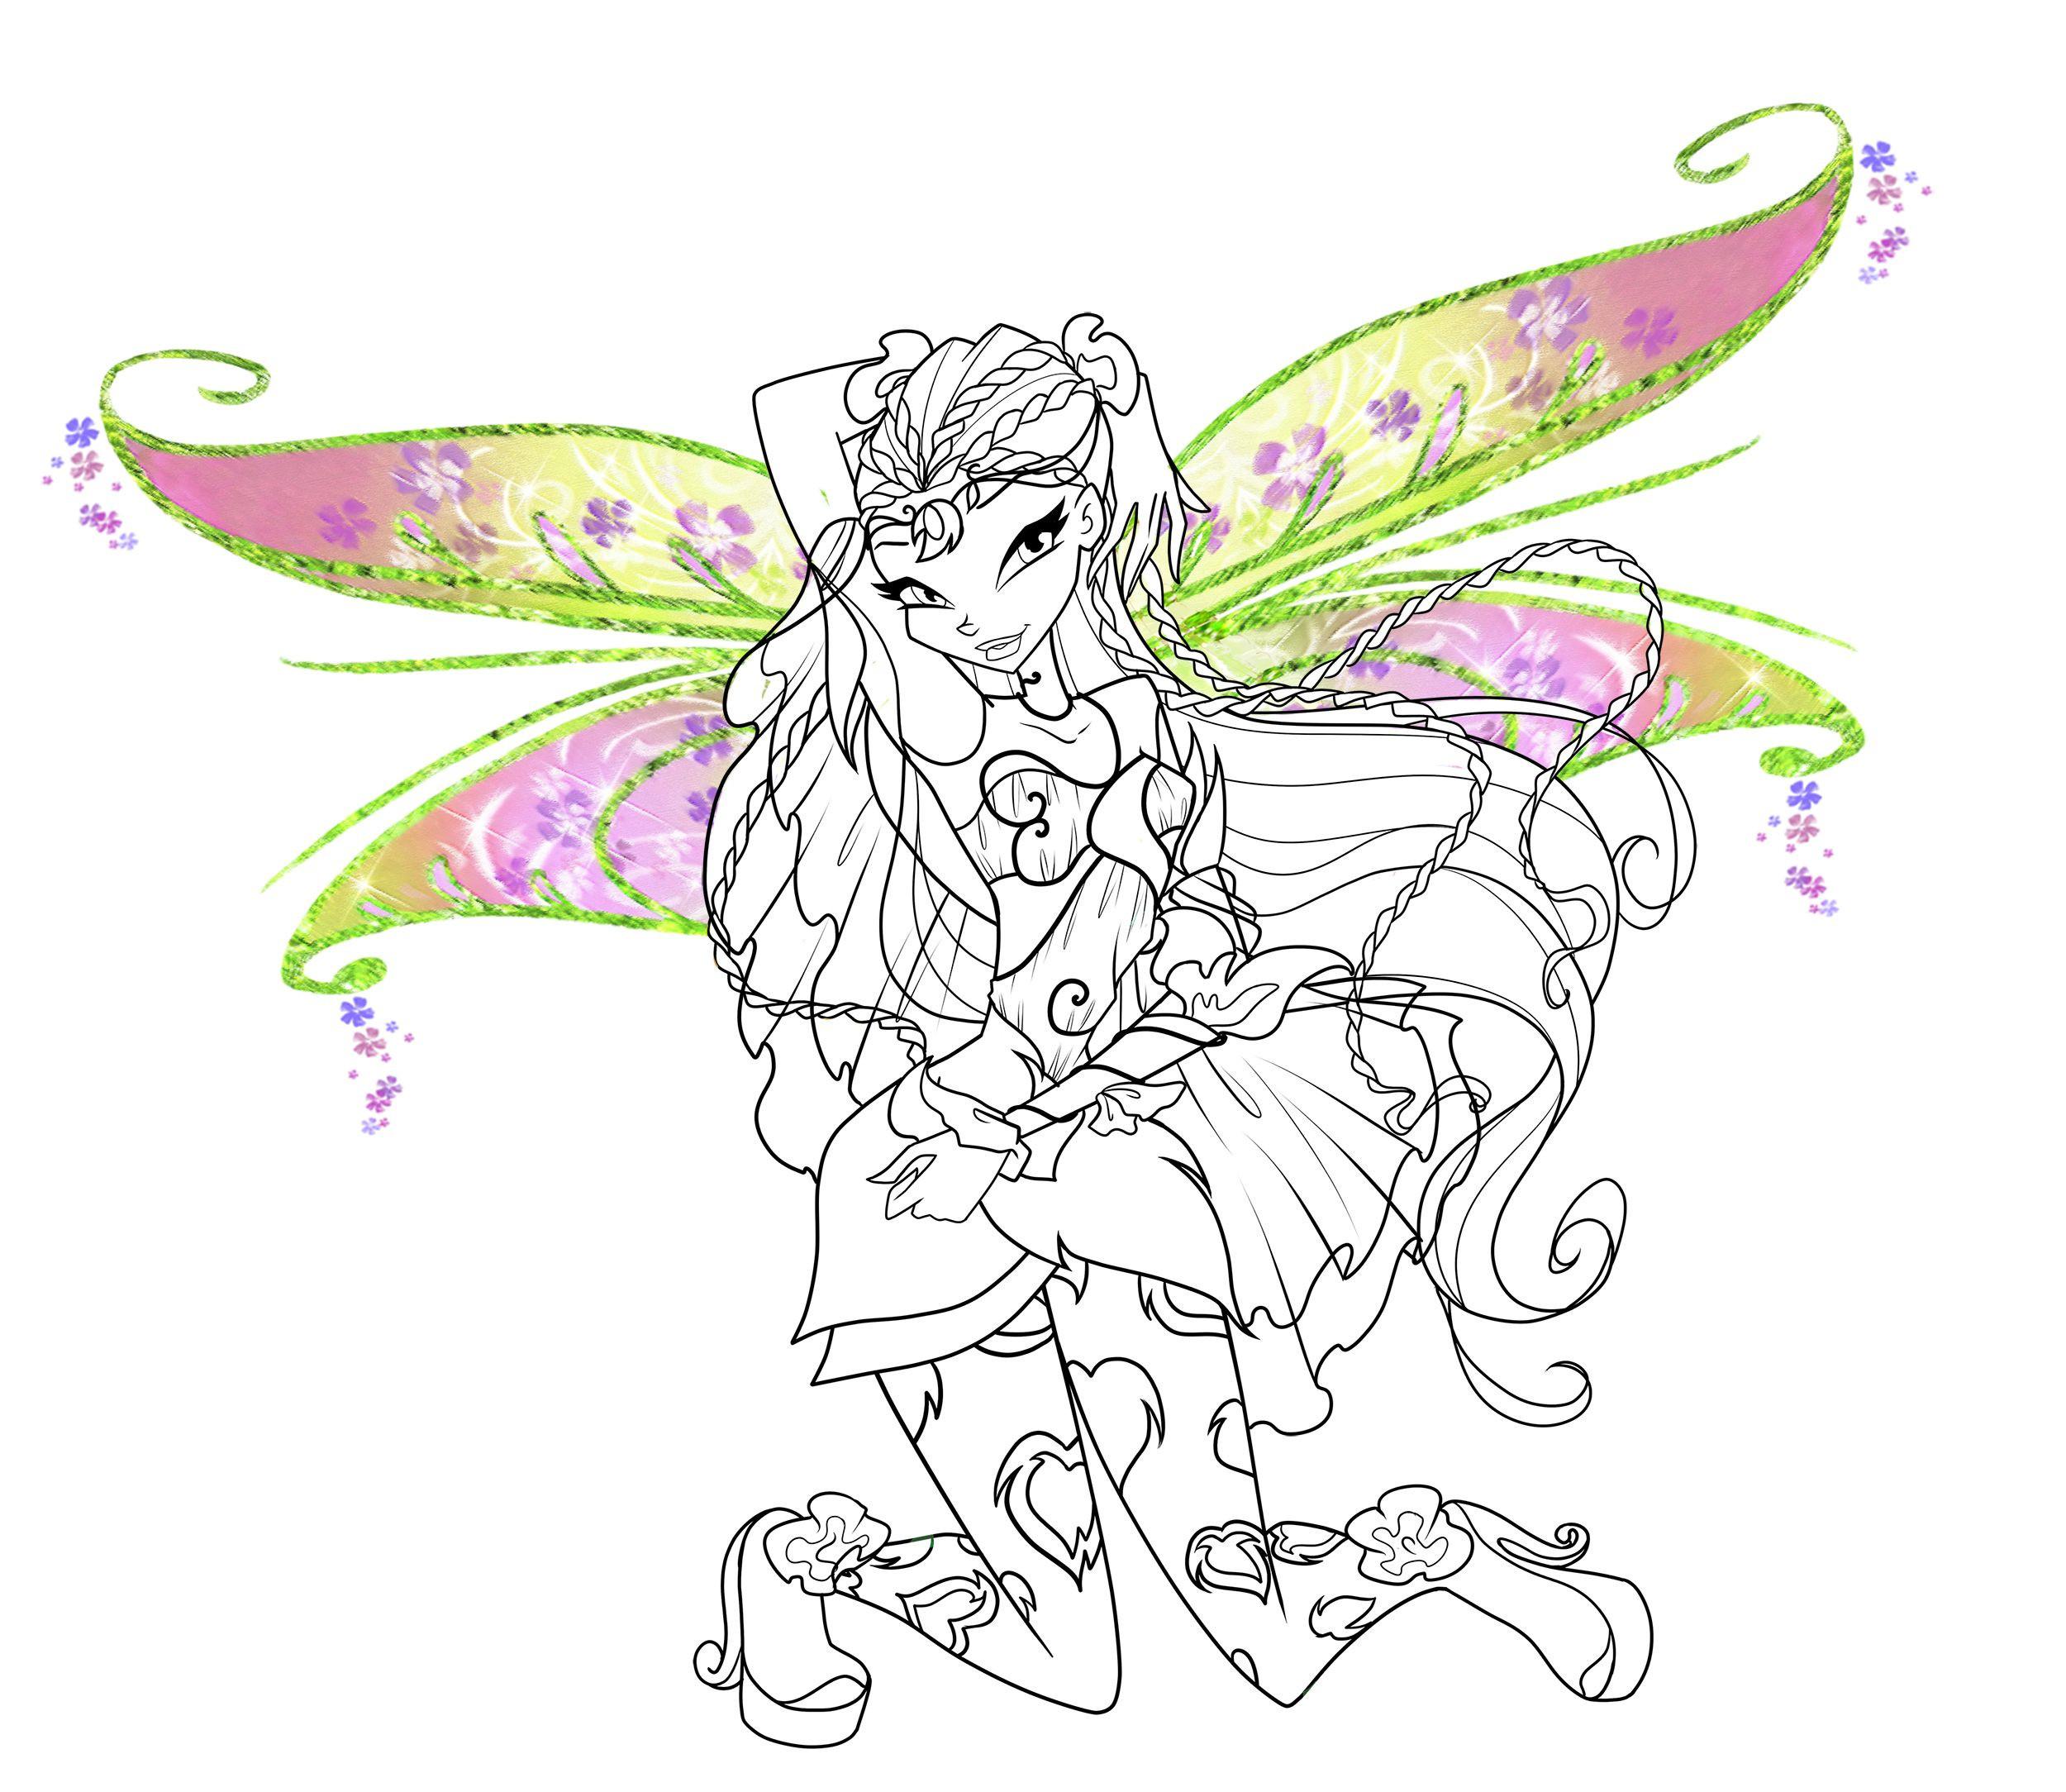 Winx Club Ausmalbilder Das Beste Von Winx Club Bloom Enchantix Coloring Pages Coloring Pages Coloring Neu Stock